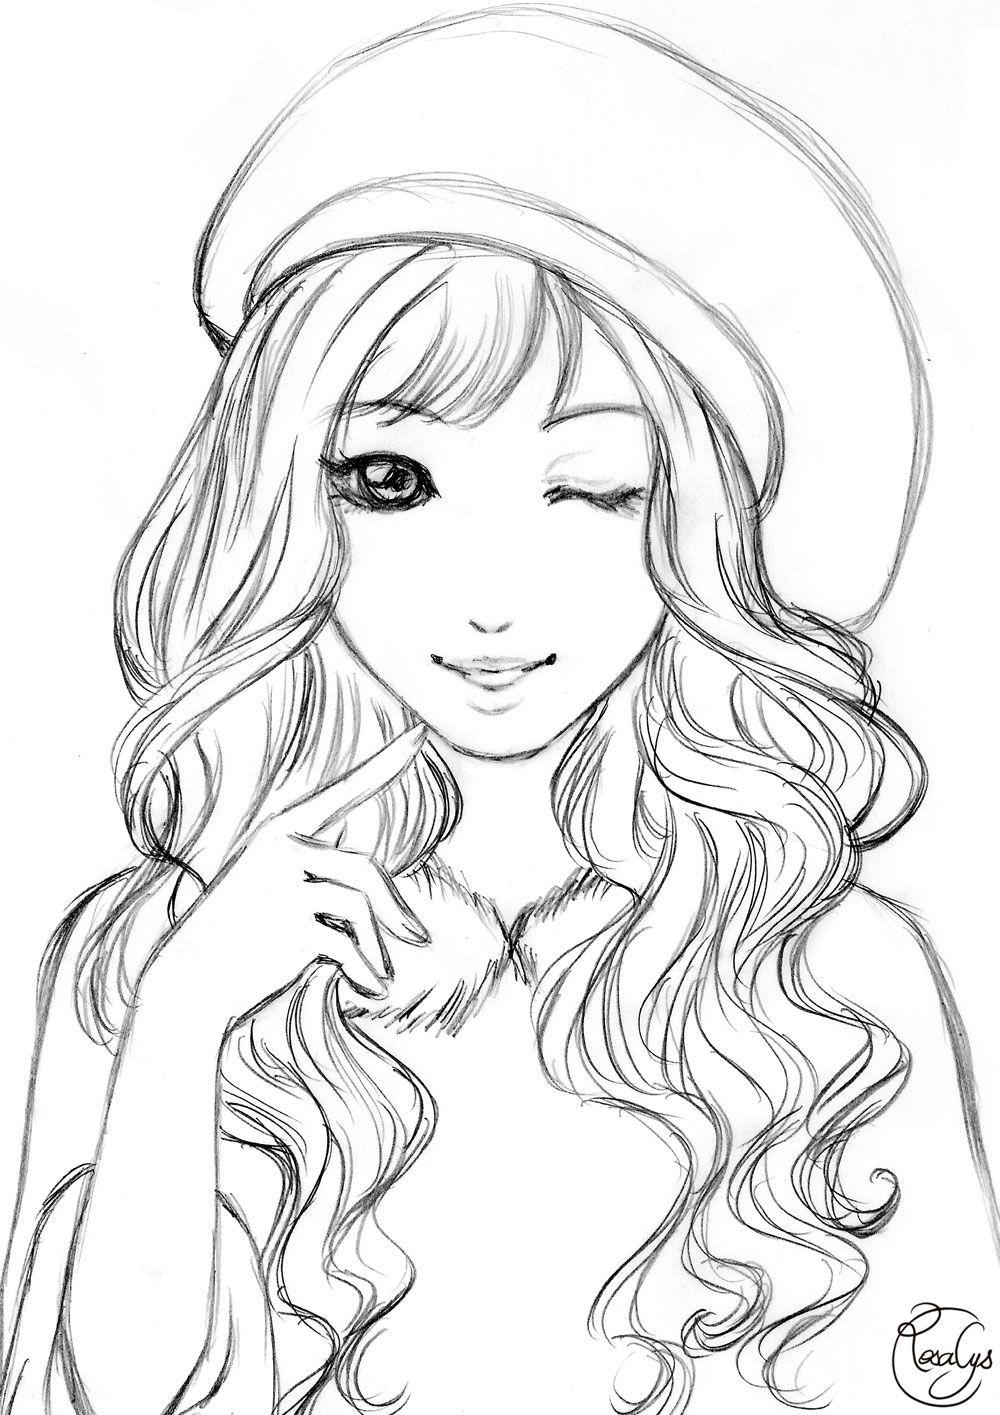 coloring sheets for girls fashion girl coisas para desenhar lindos desenhos a sheets girls for coloring